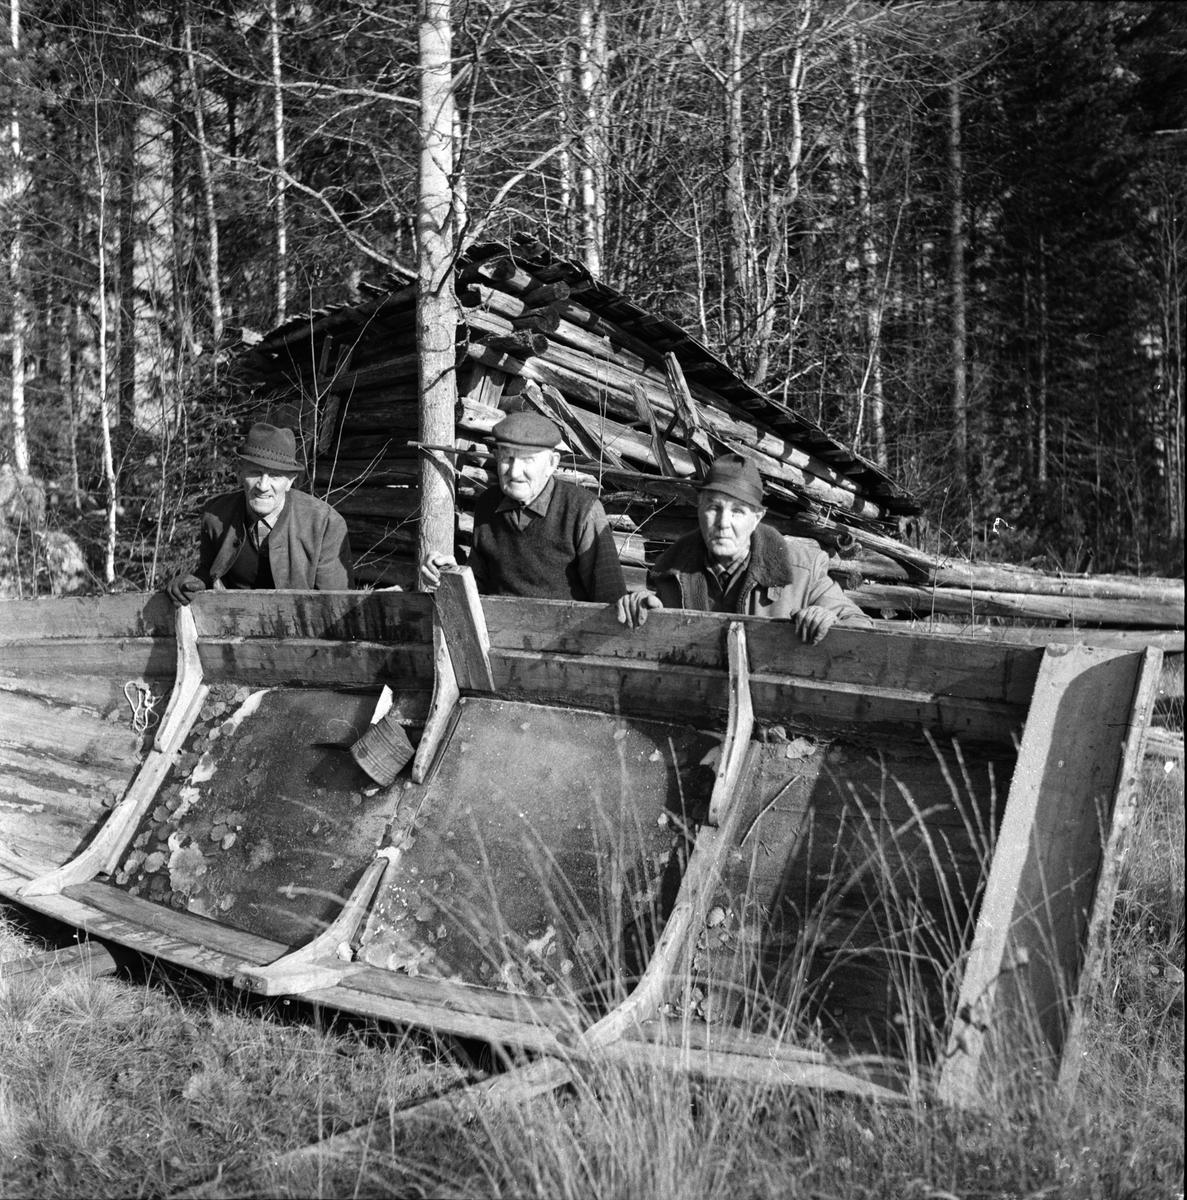 Gällsjöstuga, Iggström Oskar, Persson, Orreland, Sept 1973